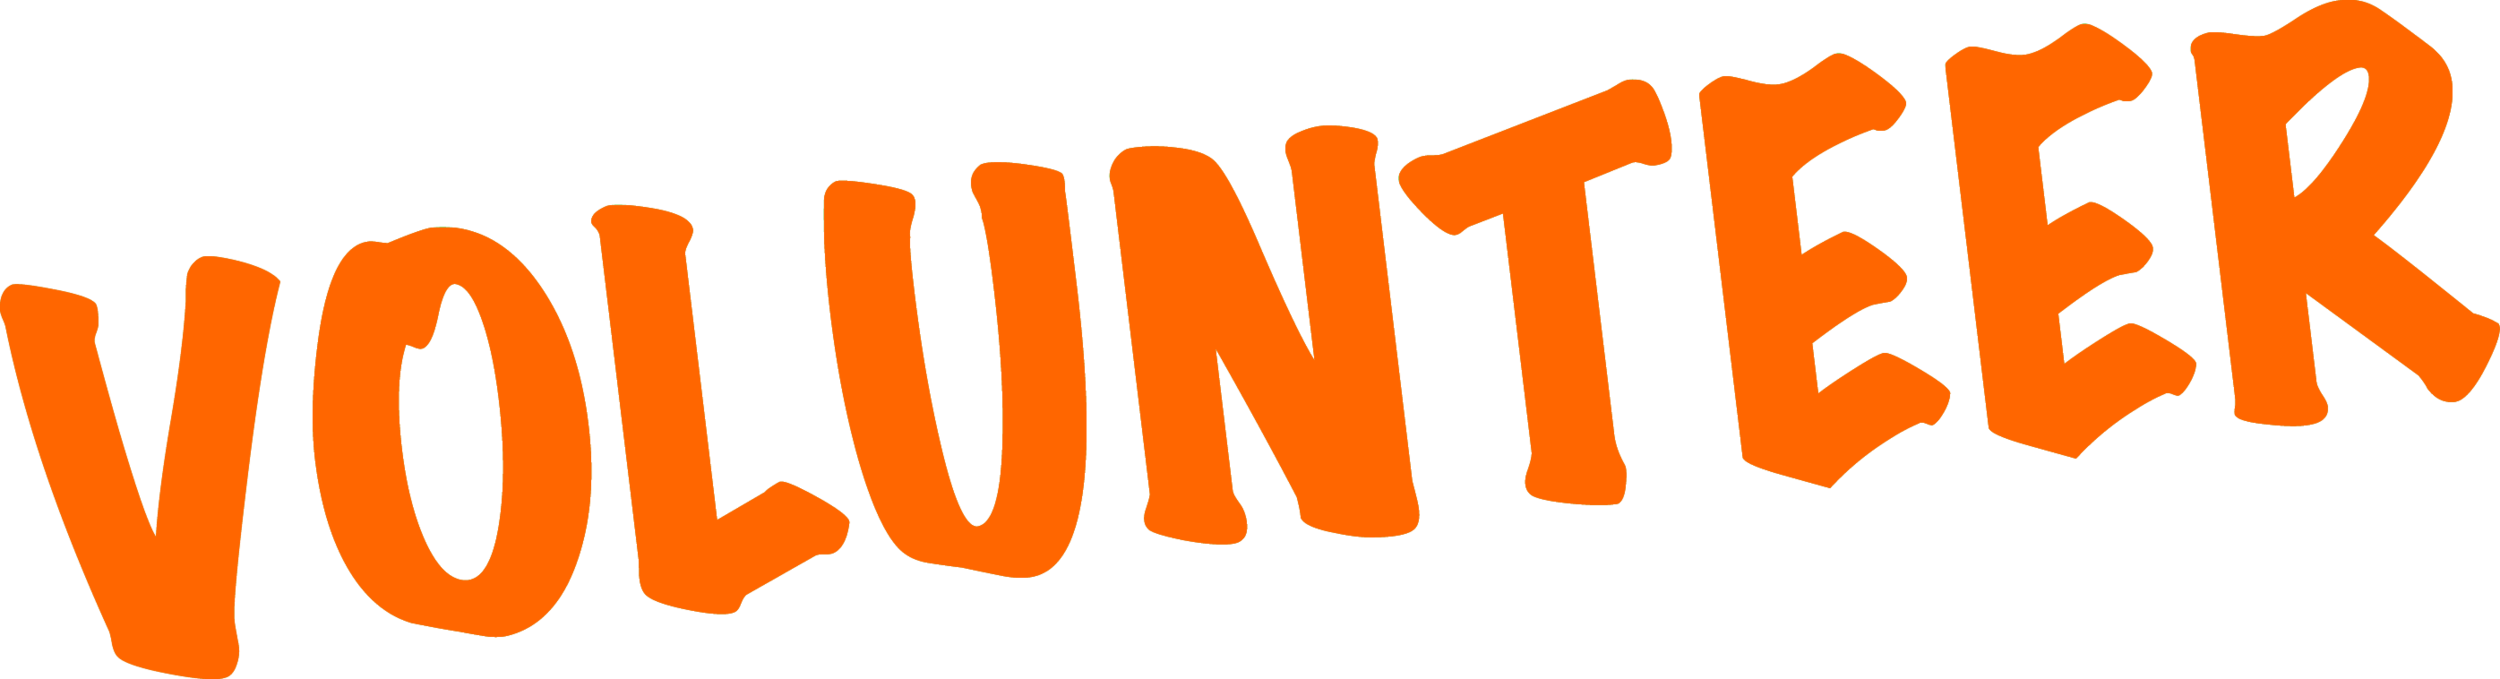 Volunteer-banner.png